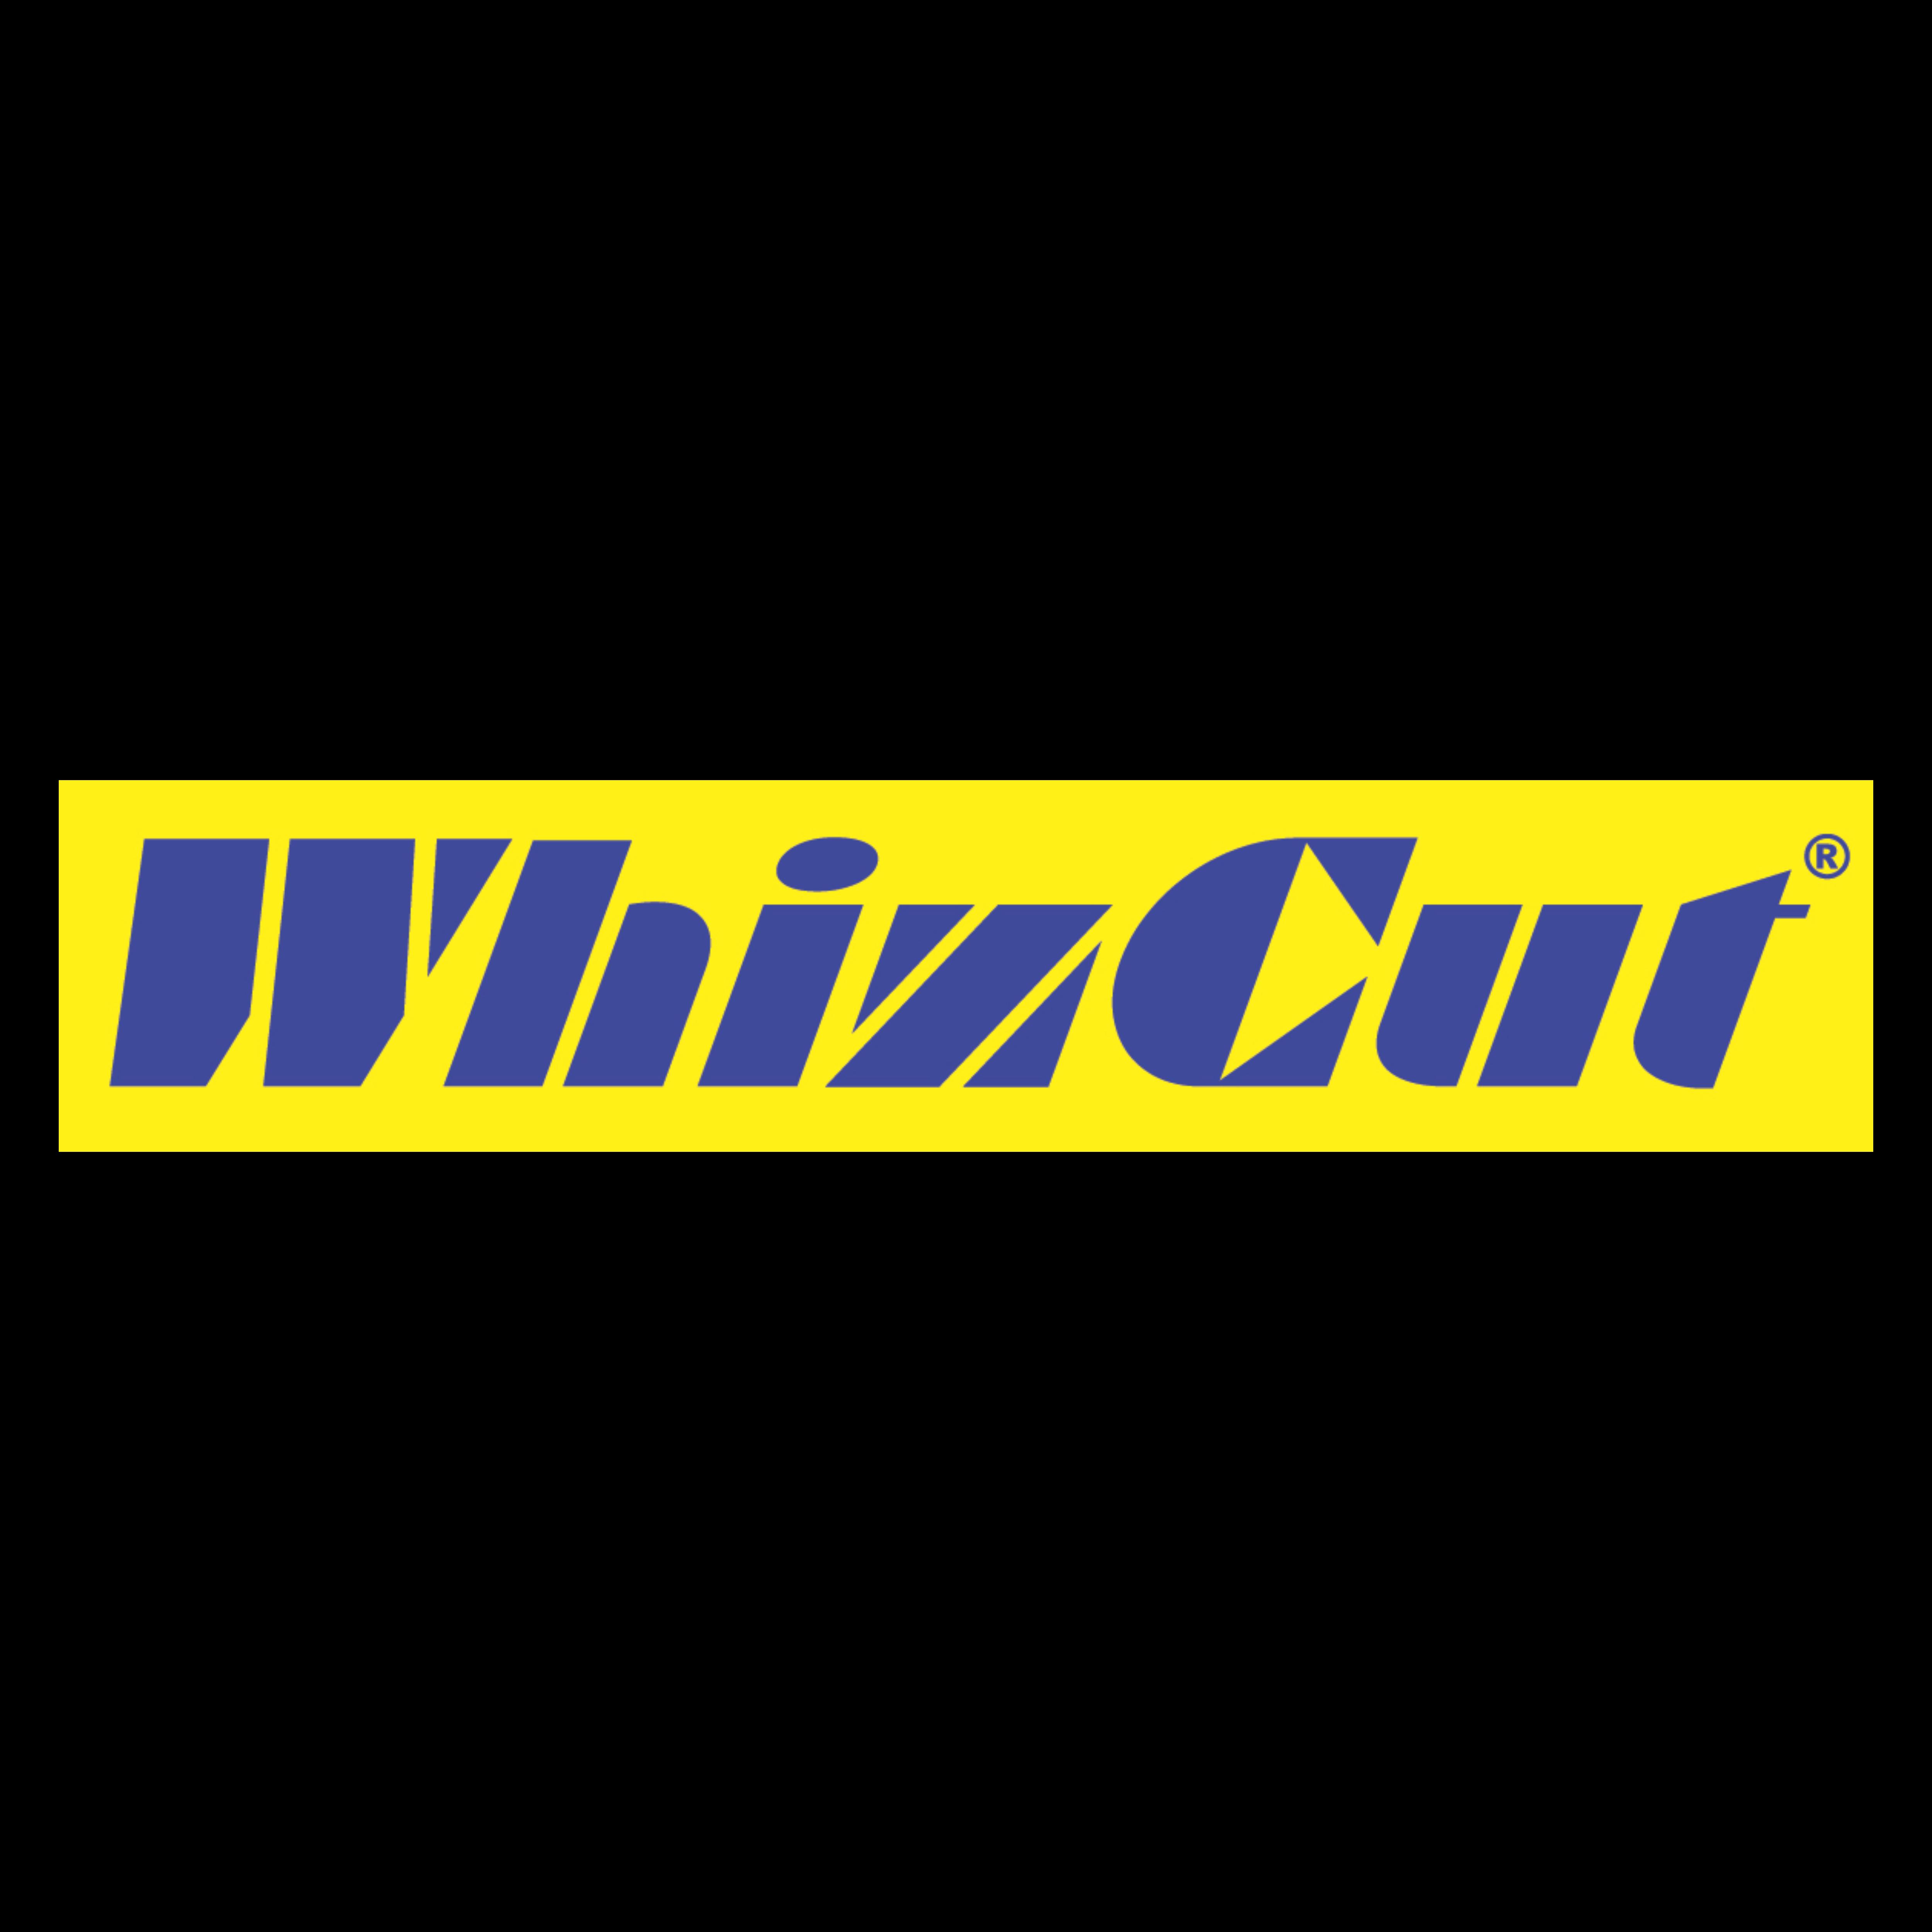 WhizCut Decoletaje